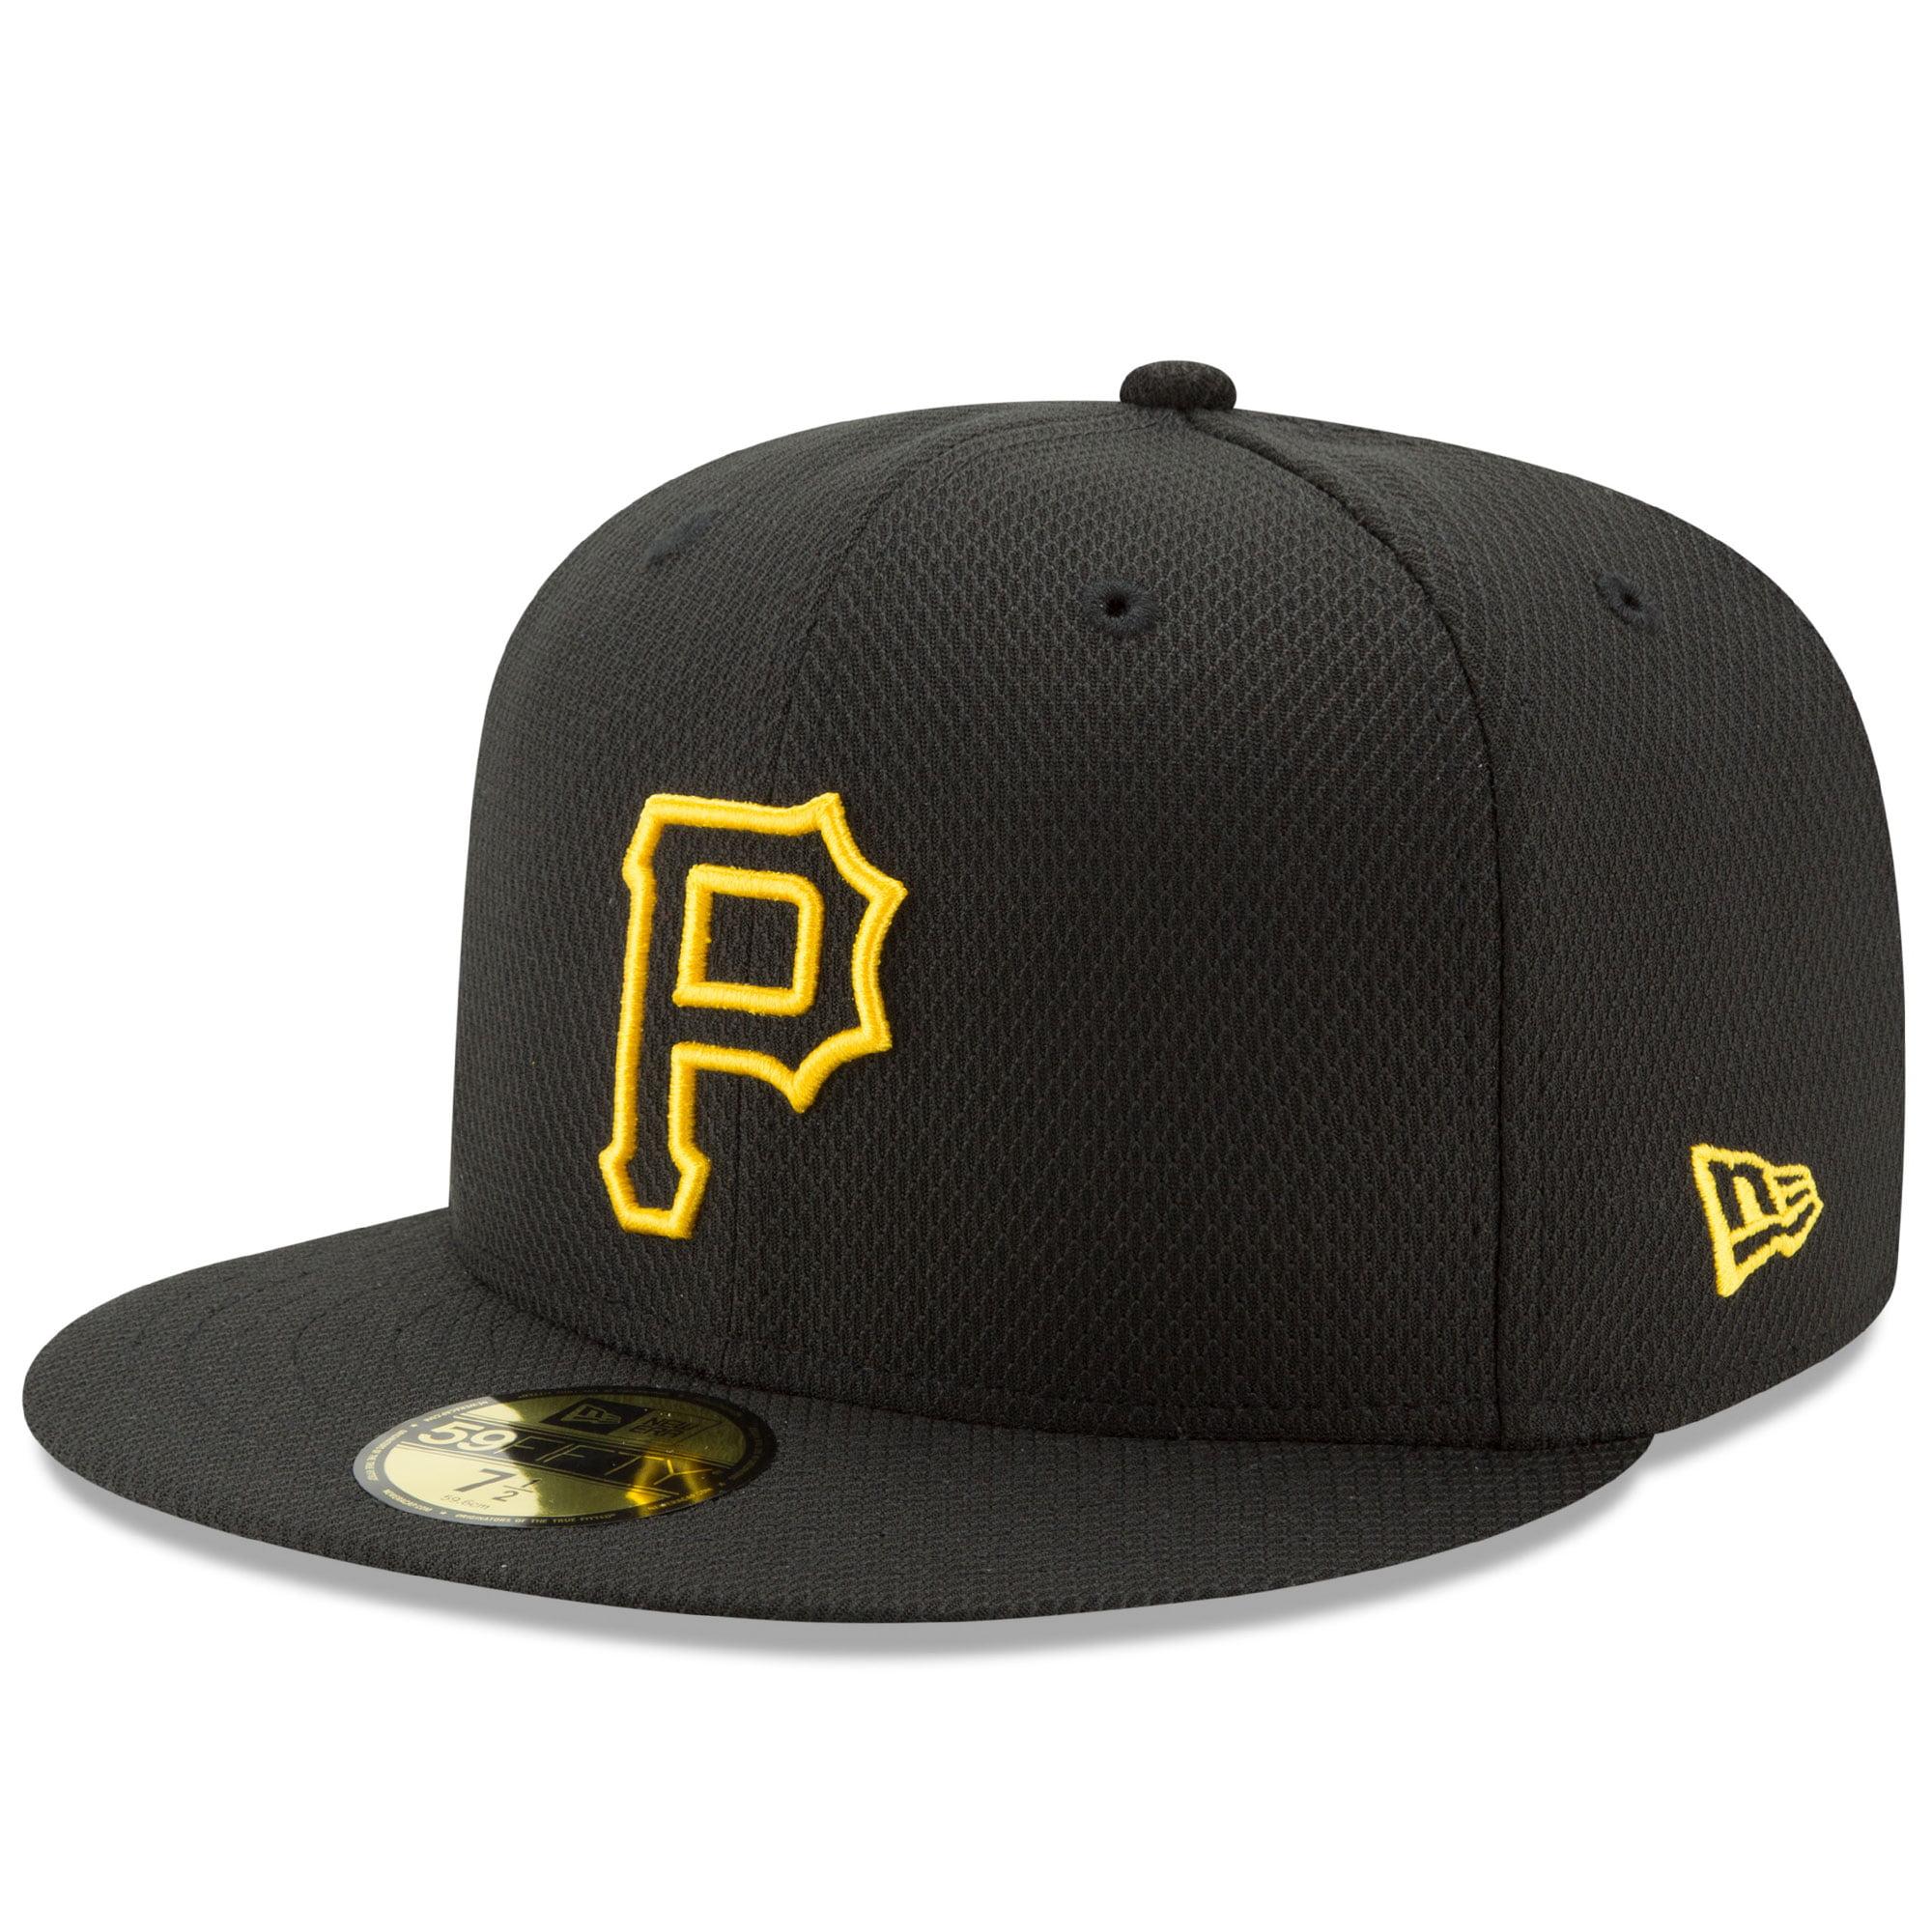 Pittsburgh Pirates New Era Diamond Era 59FIFTY Fitted Hat - Black